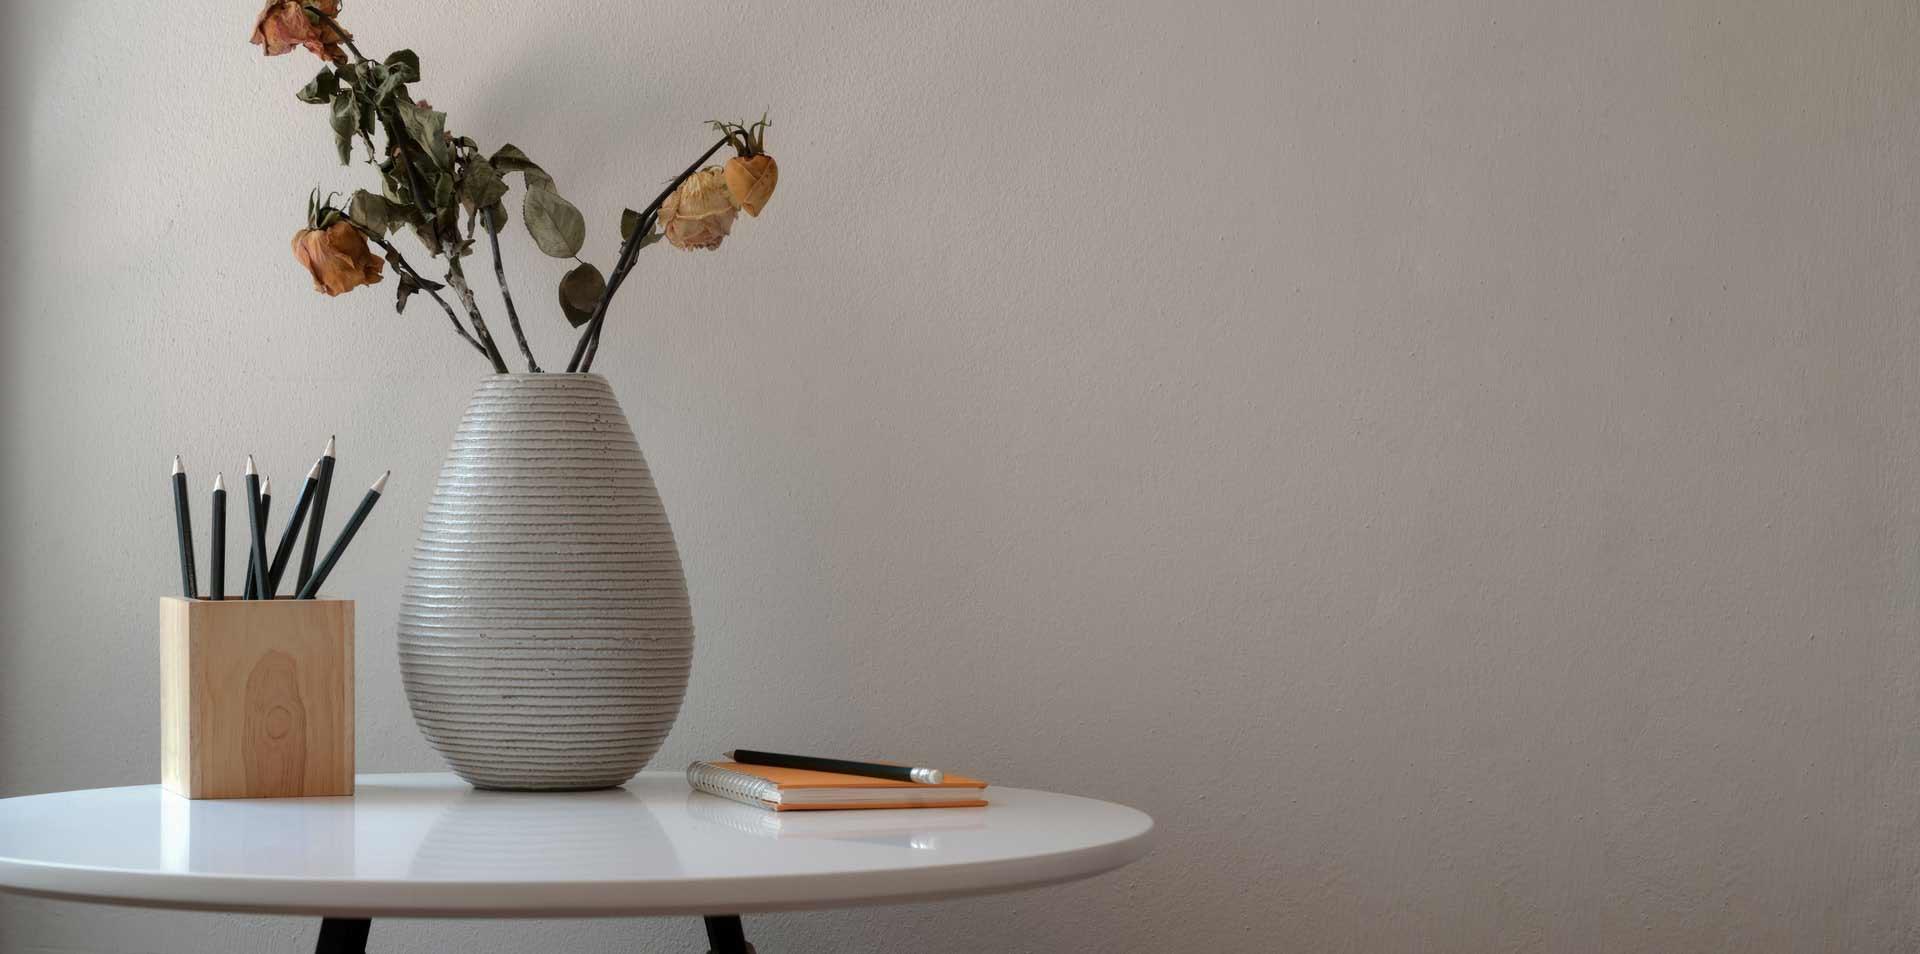 flower-vase-beside-notebook-and-pencils-3773389